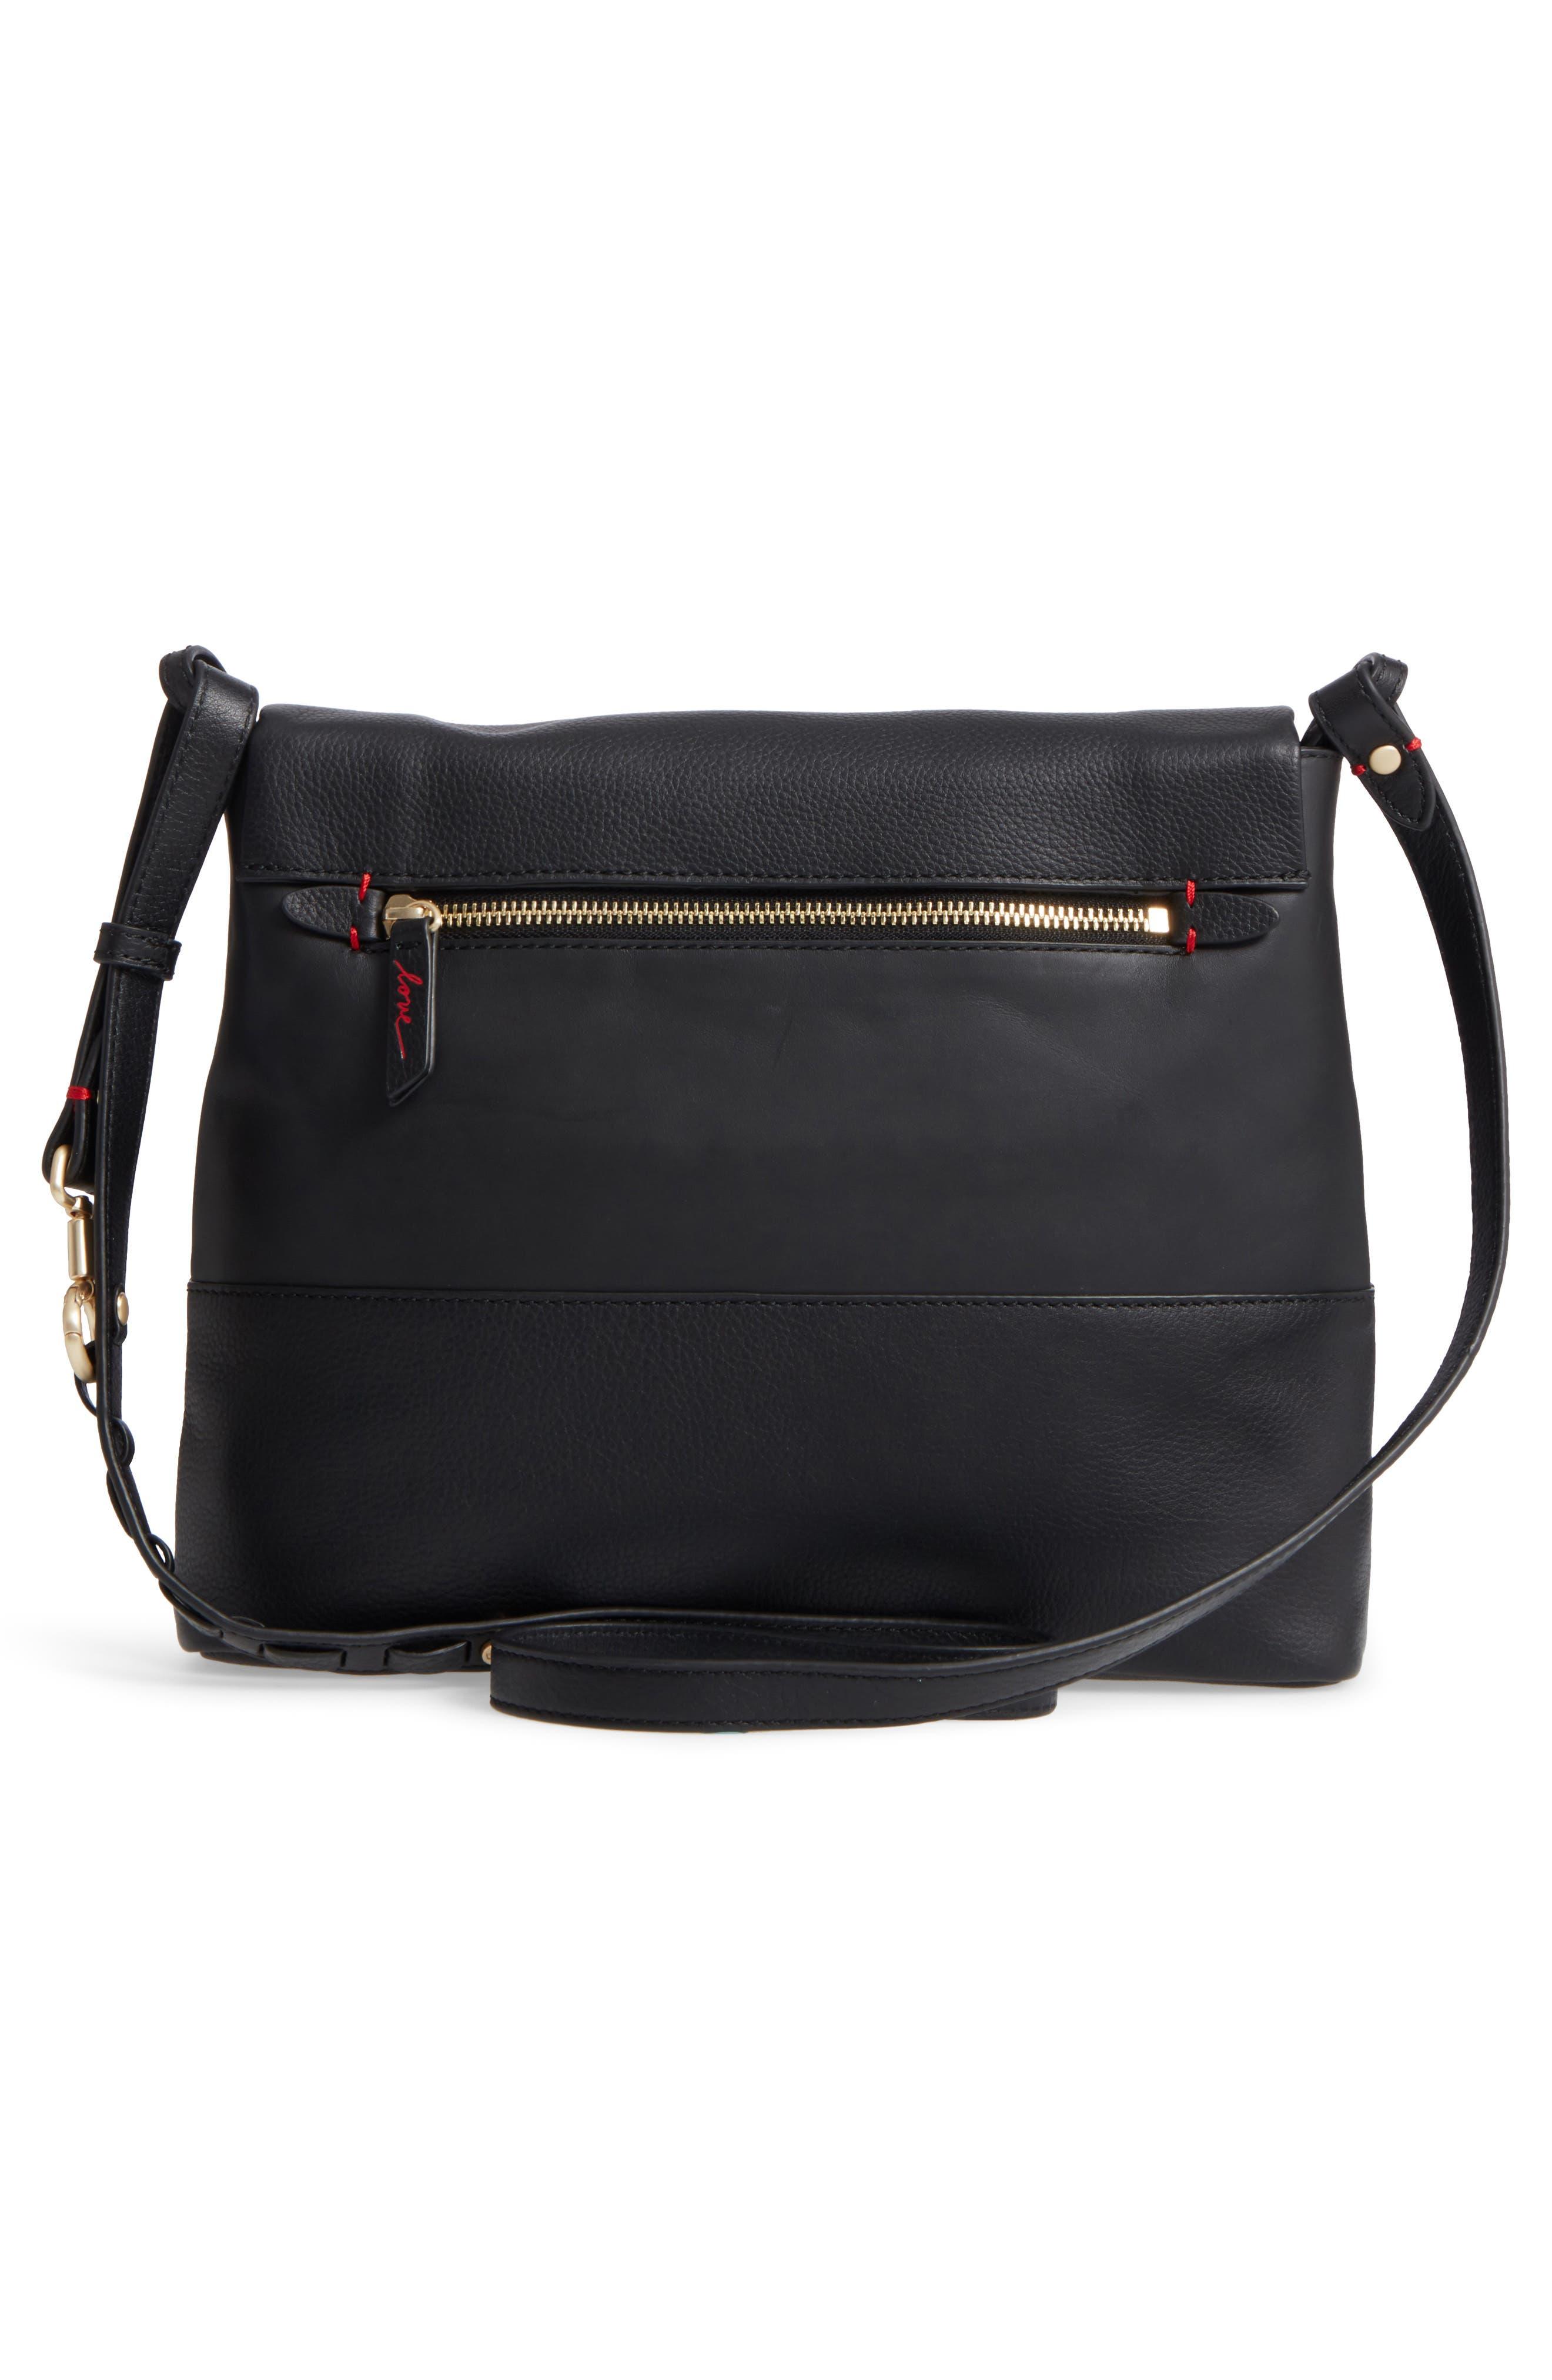 Medium Brea Crossbody Bag,                             Alternate thumbnail 3, color,                             001